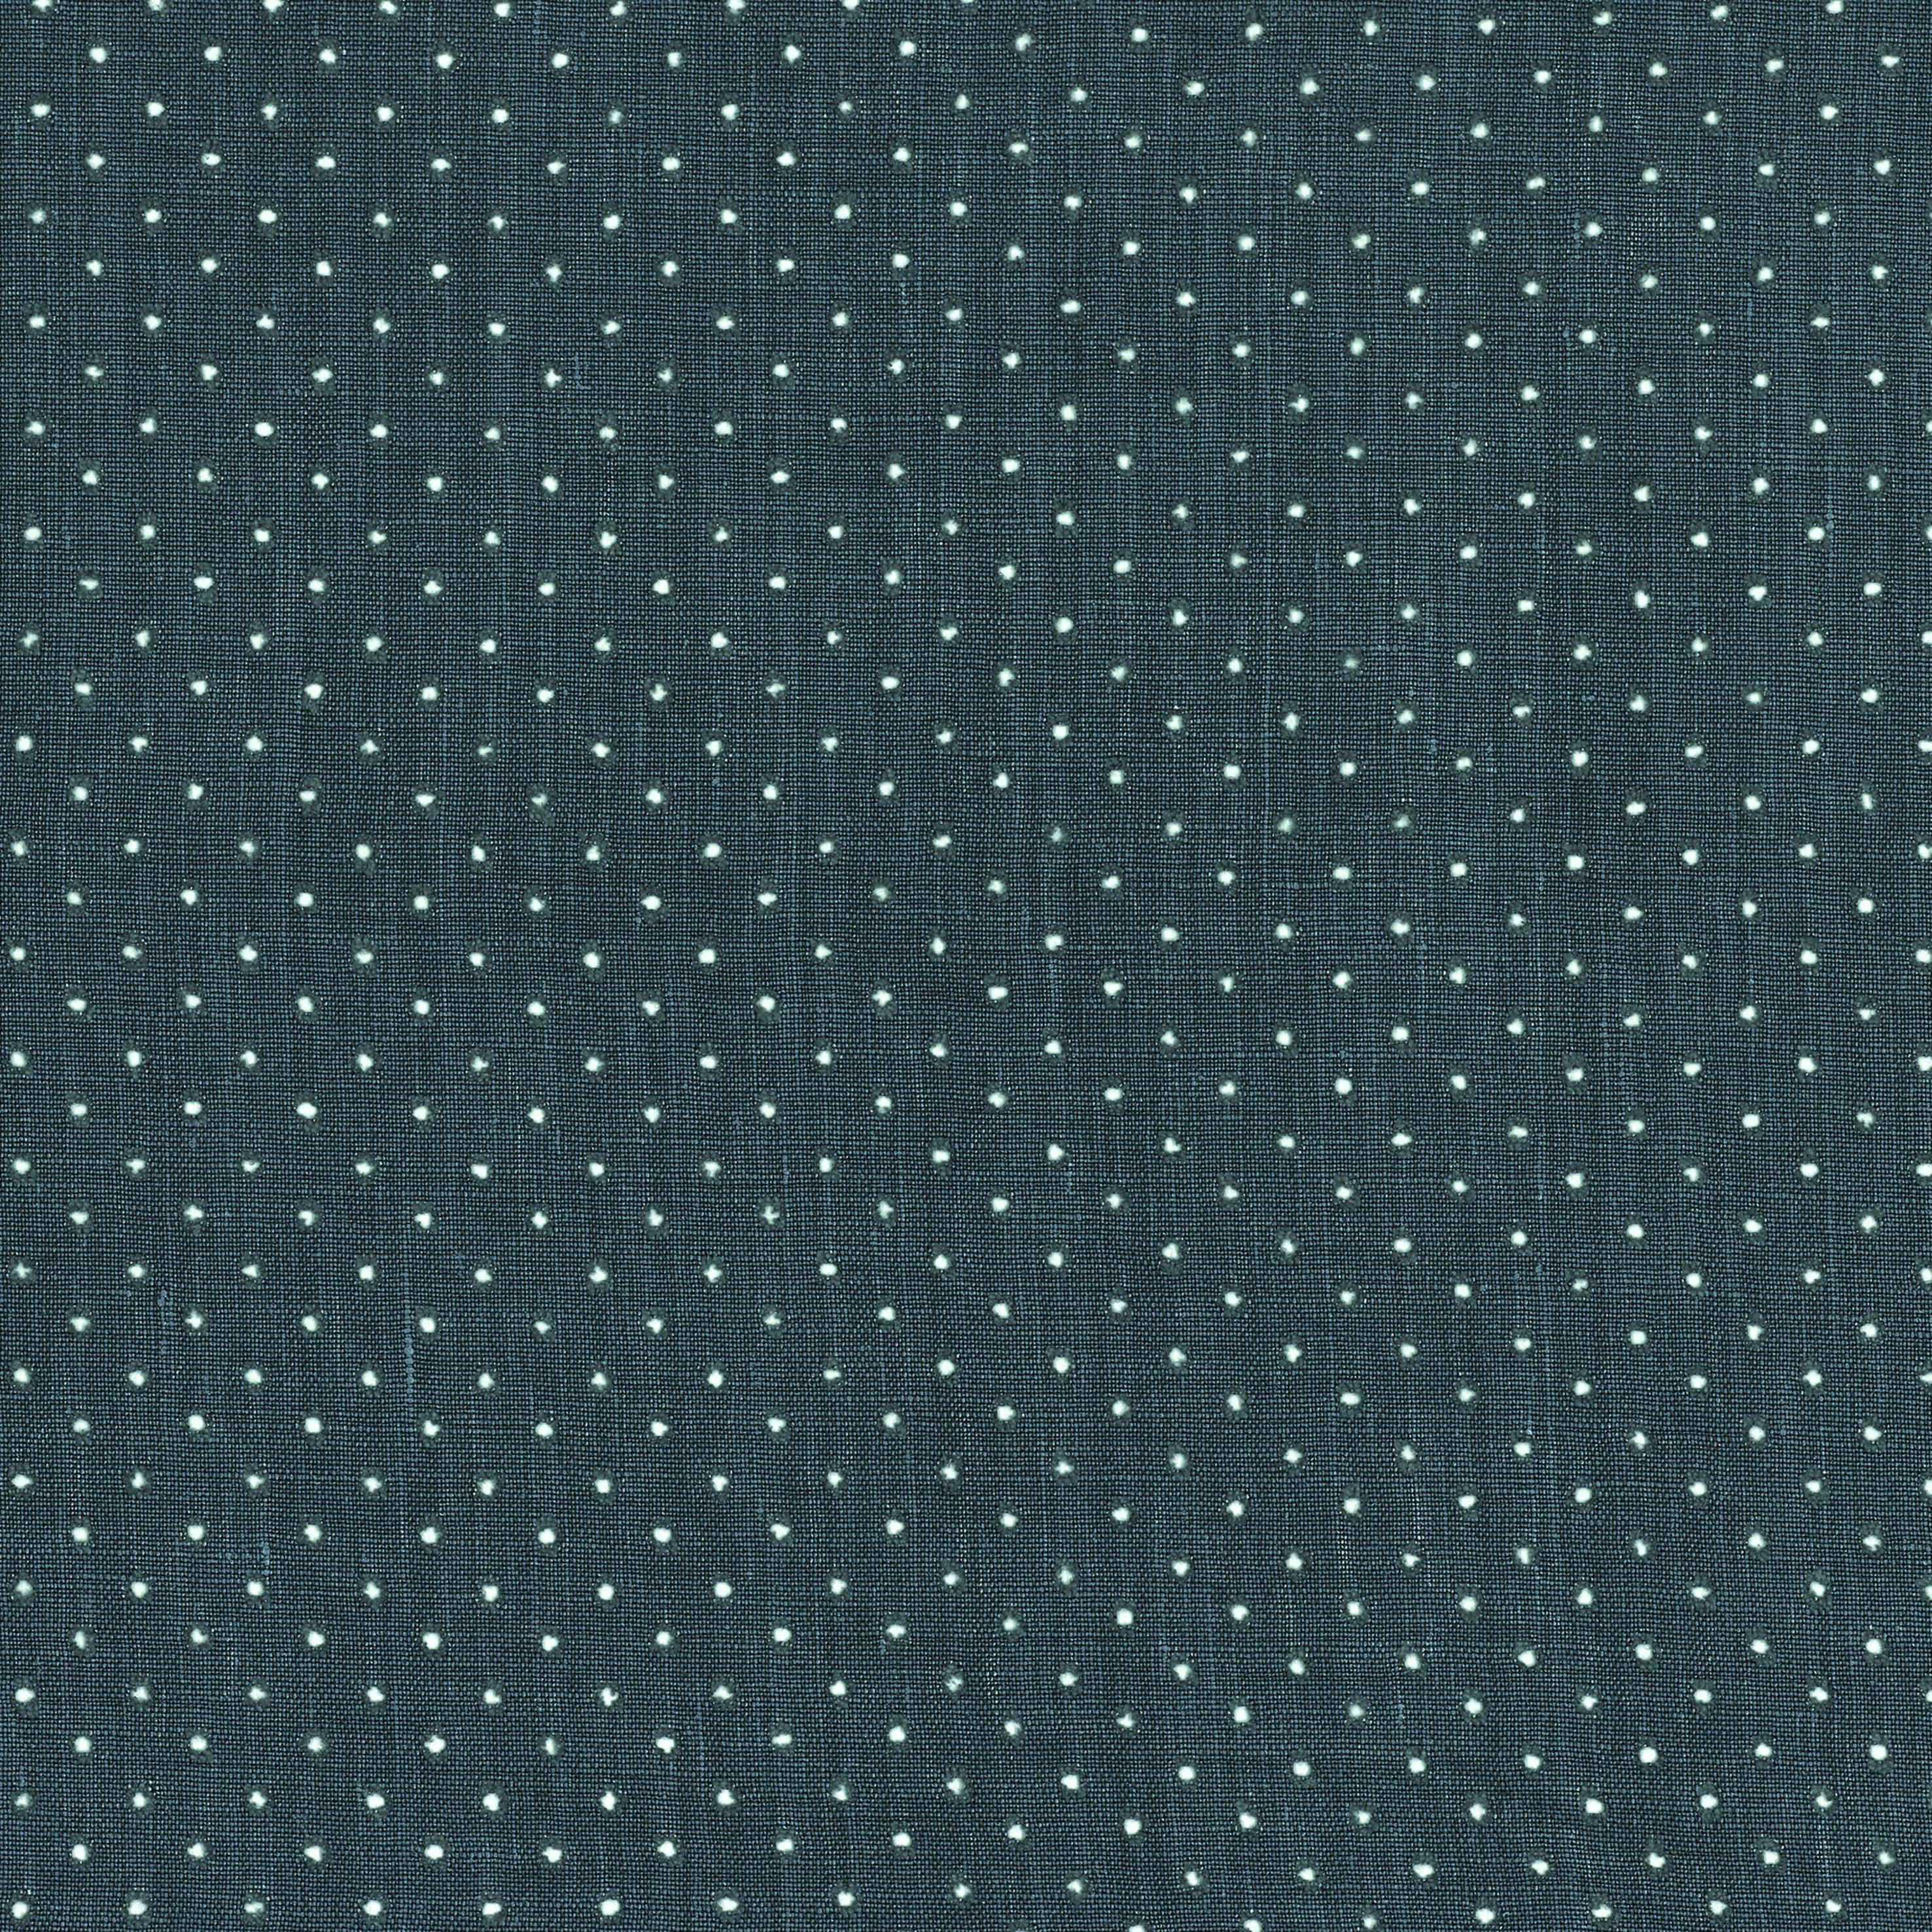 Zepel Fabrics Casamance Fabrics Wallpapers   Exclusive Aust 2953x2953